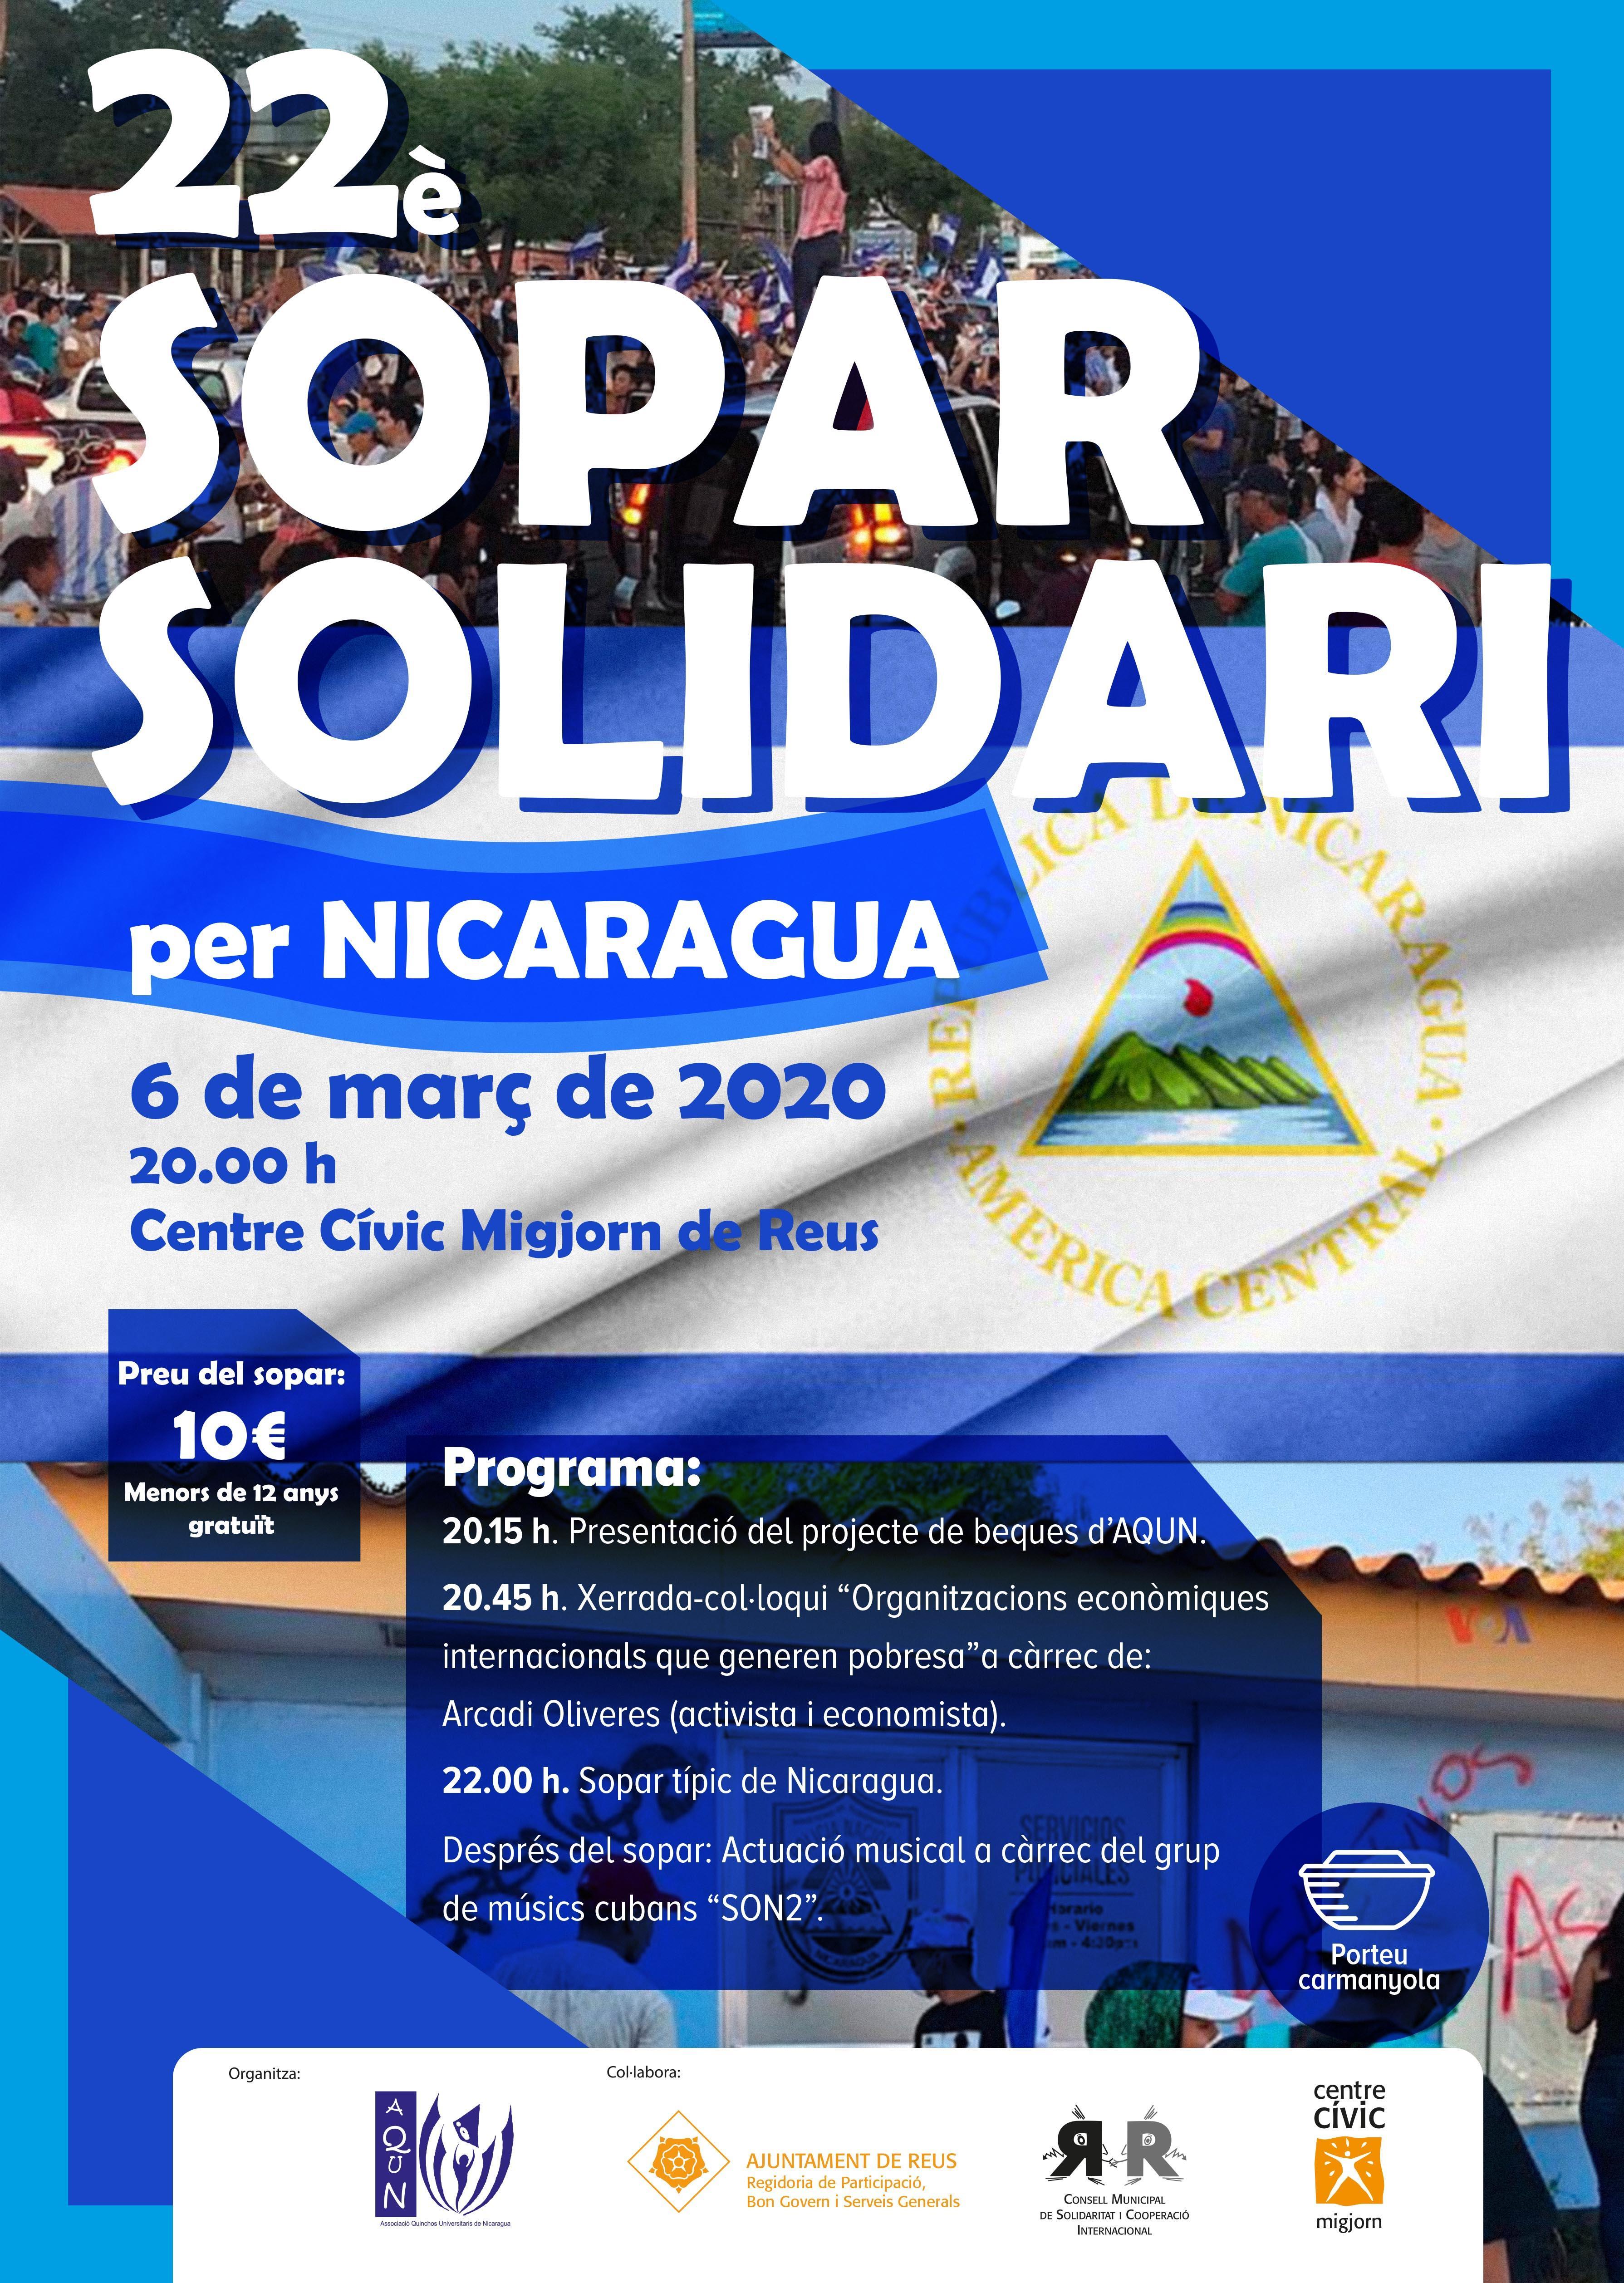 22è Sopar Solidari per NicaraguaE